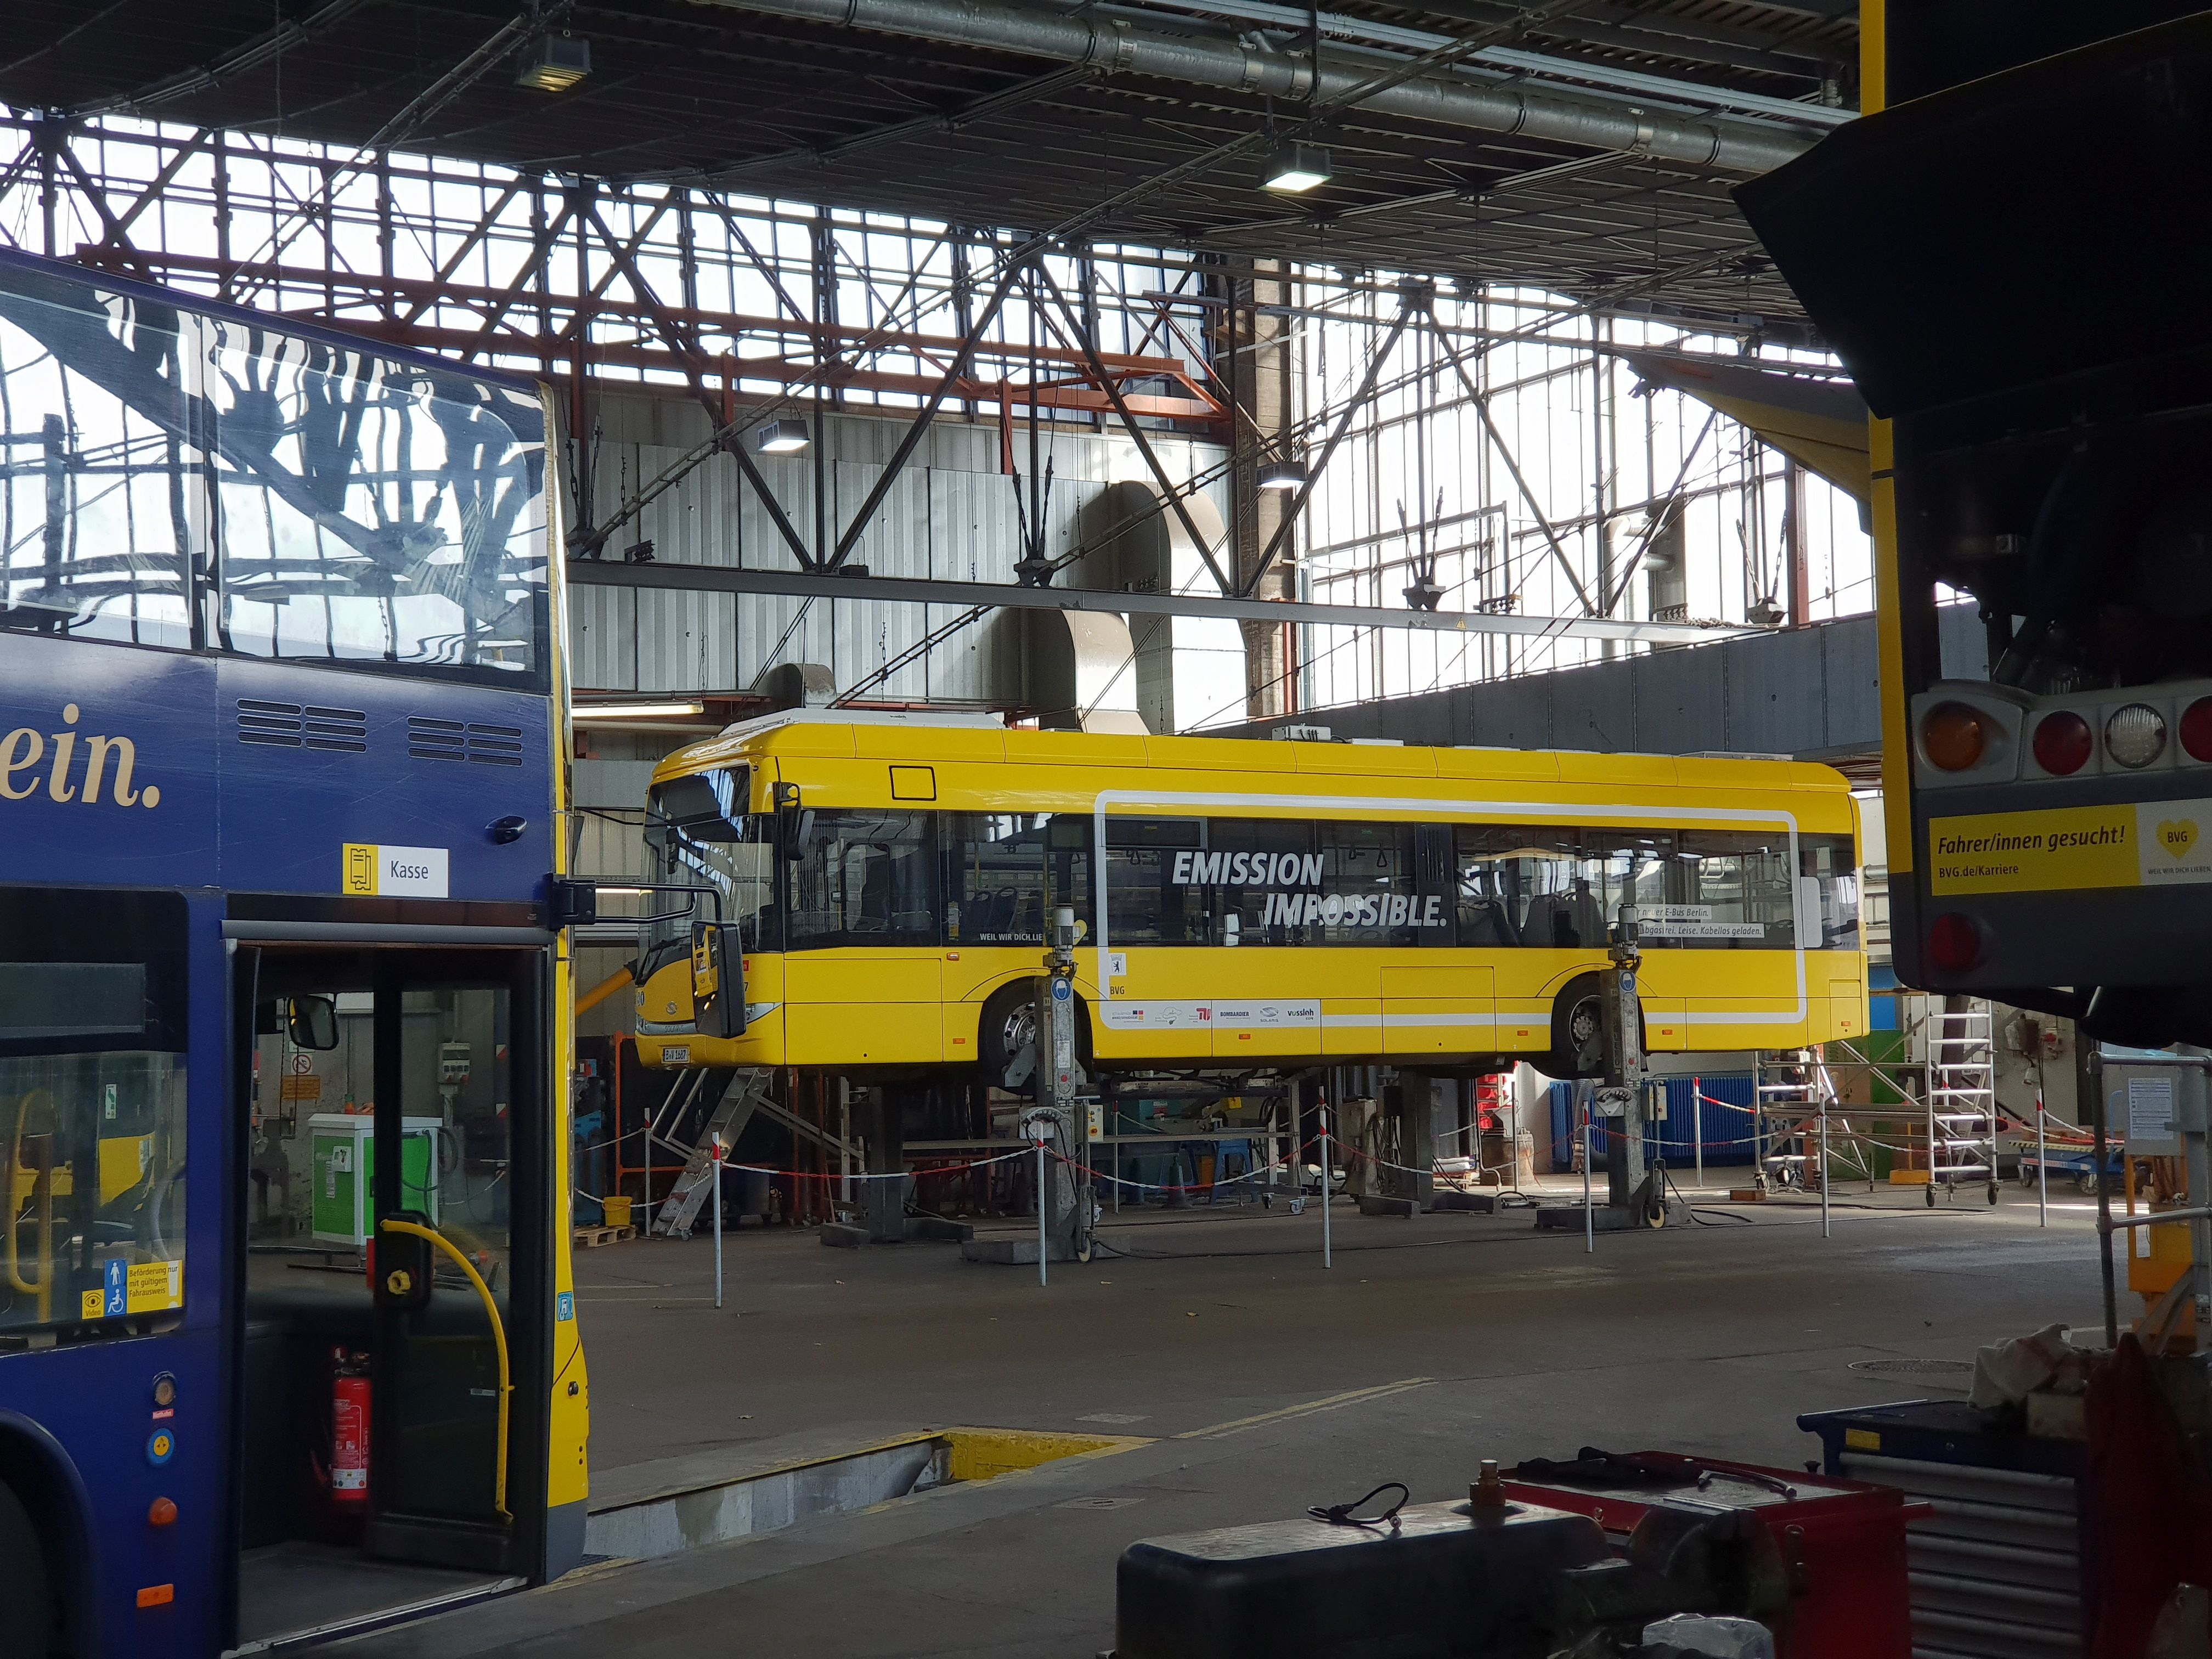 Foto: Bus 1687, Typ Solaris Urbino 12 Electric, Hof Siegfriedstr., September 2018